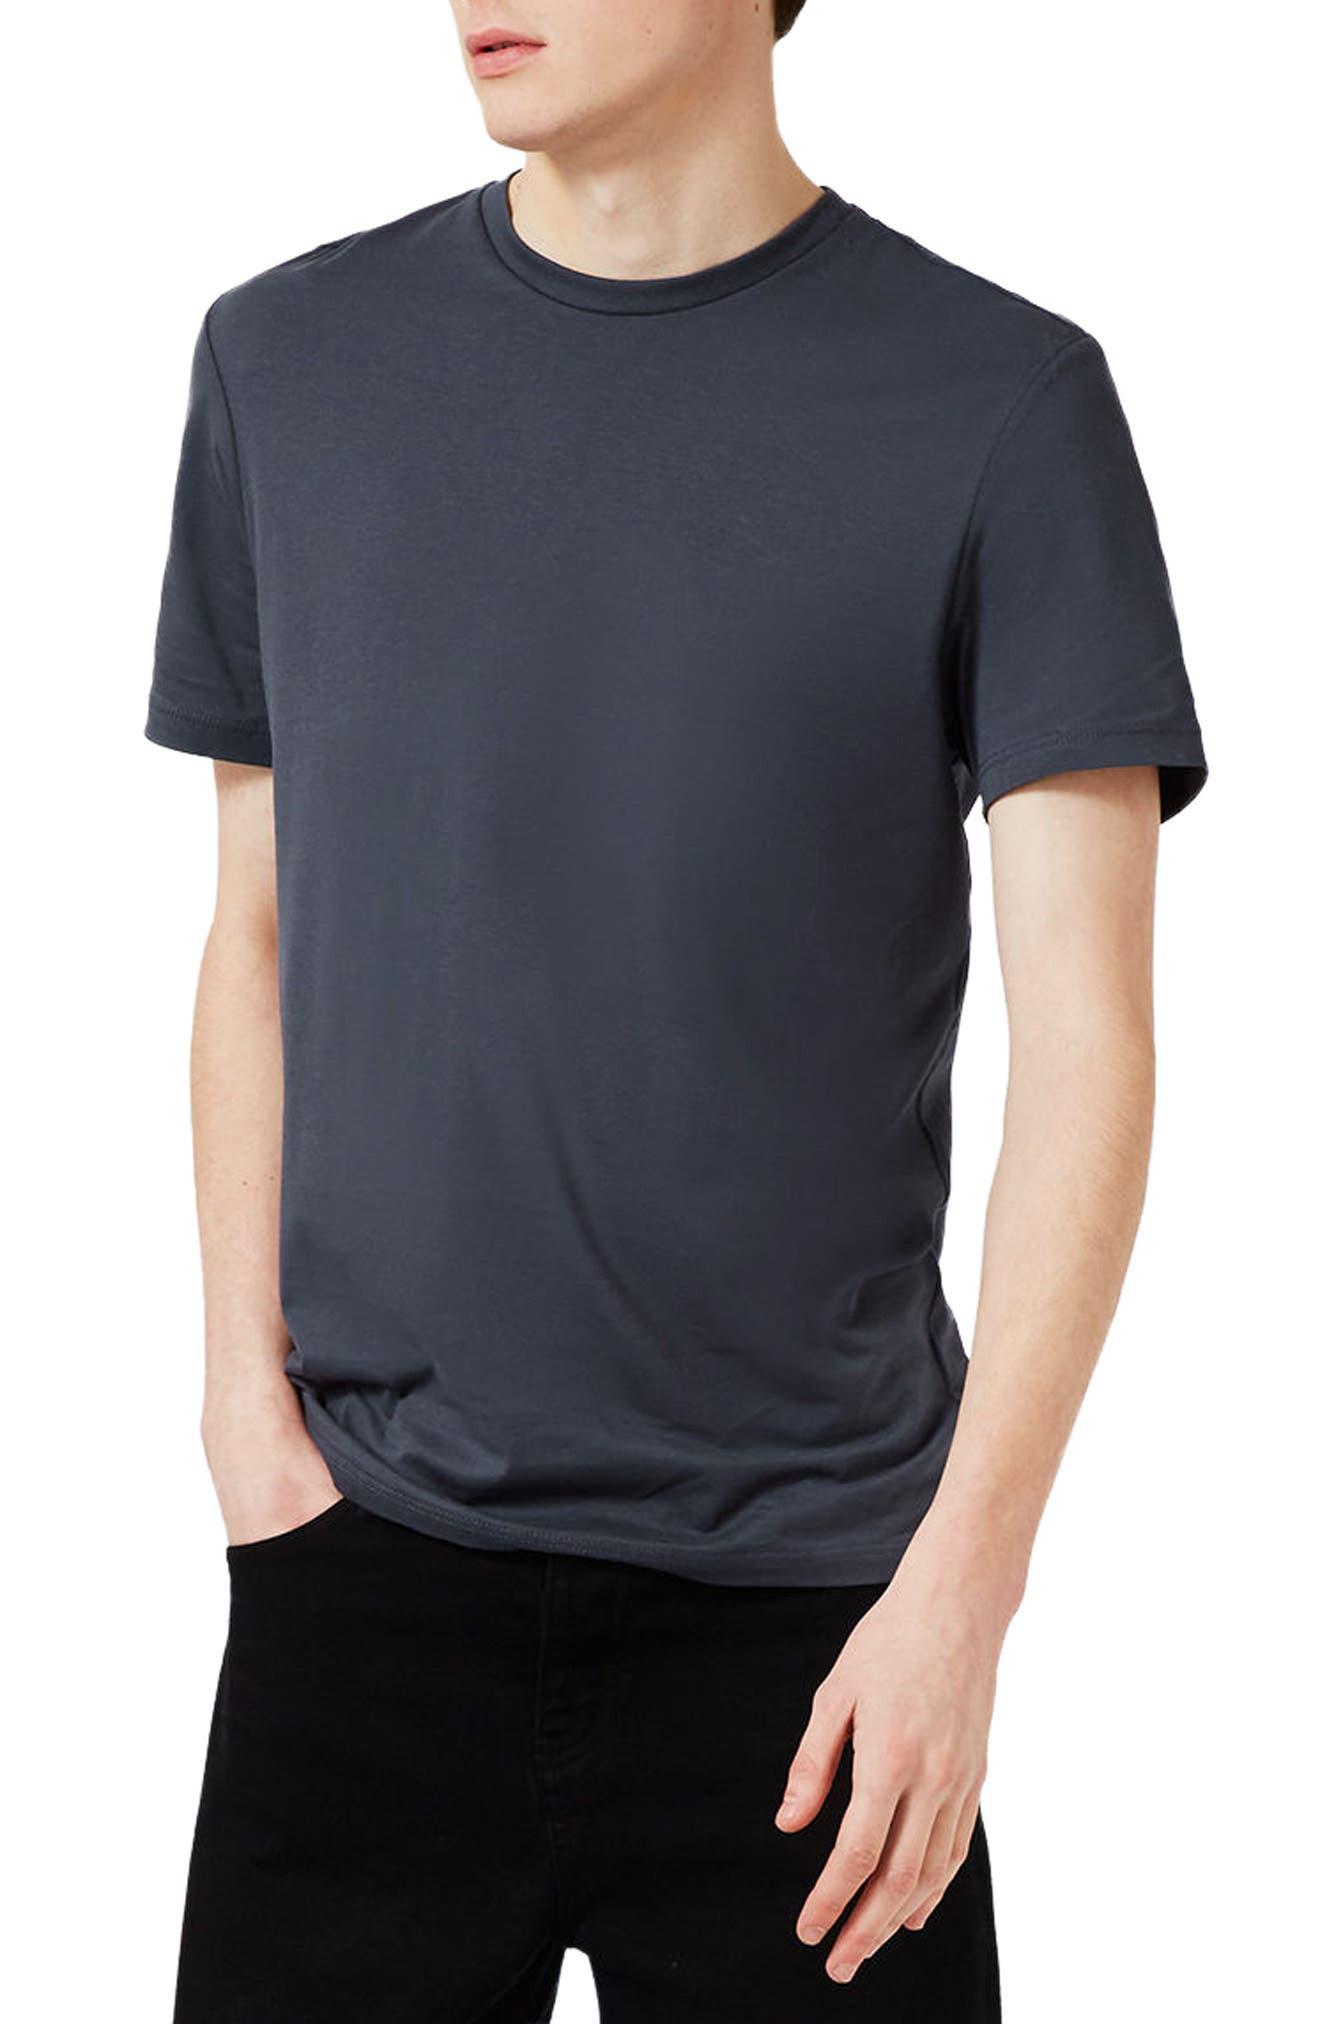 Black t shirt topman - Black T Shirt Topman 47